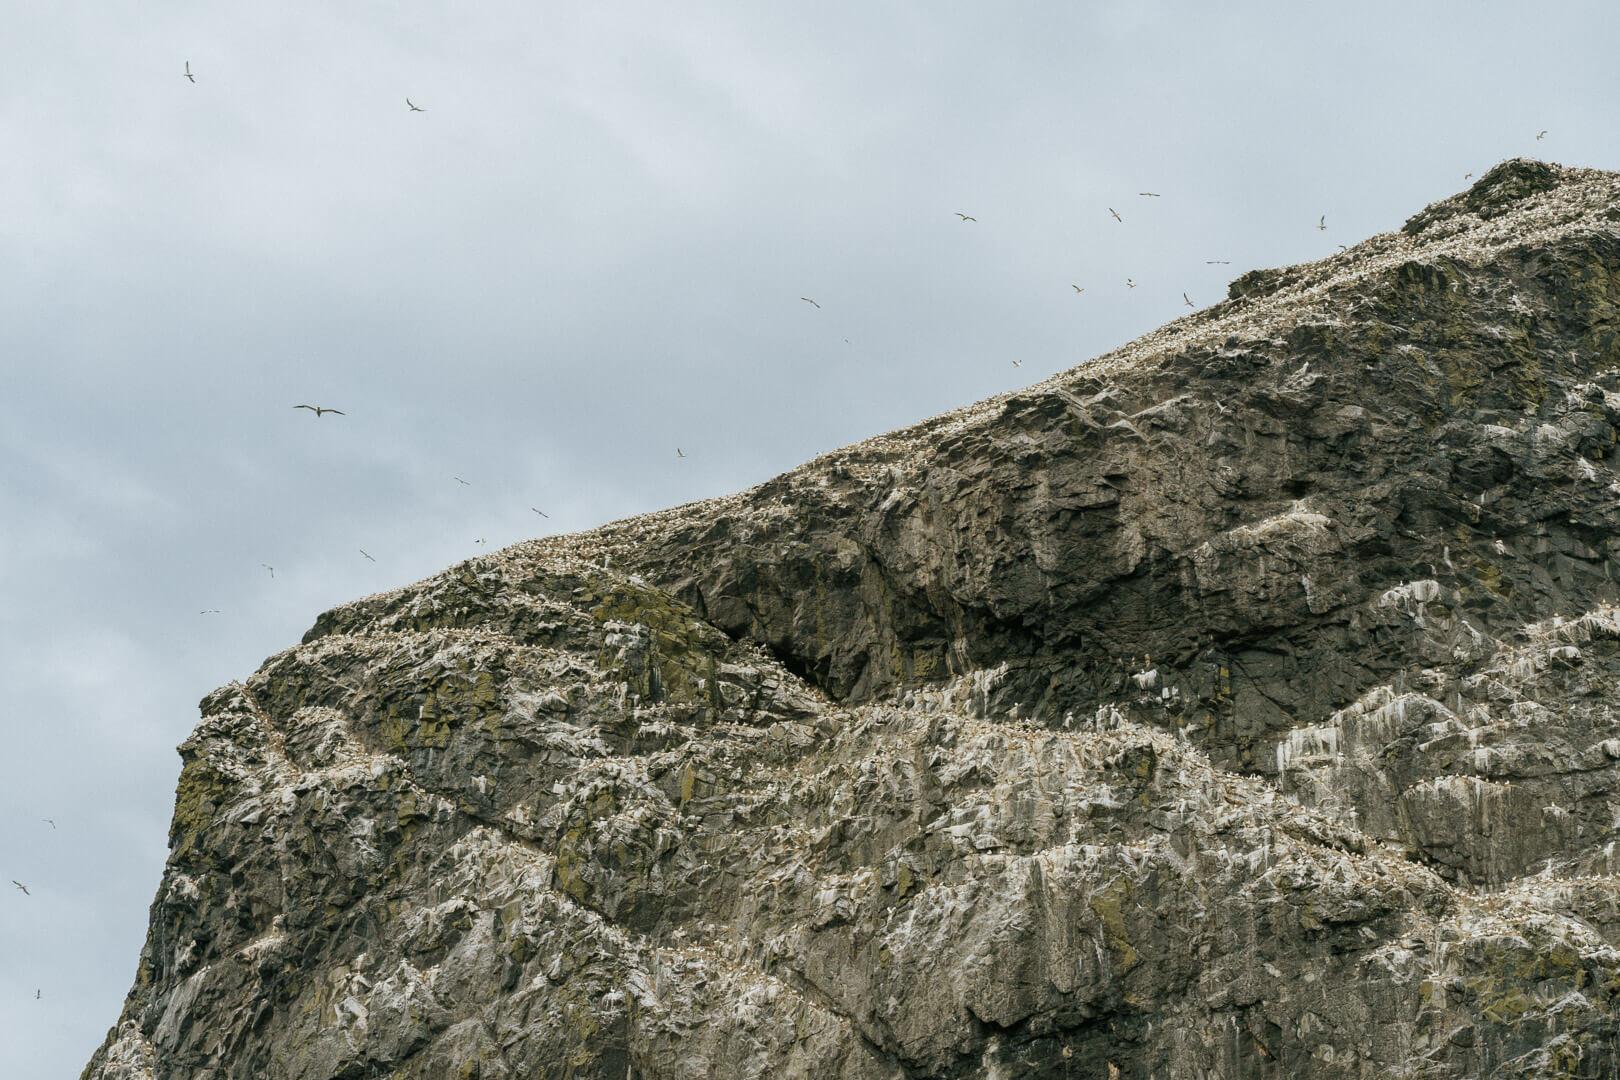 Bird Colonies at St kilda